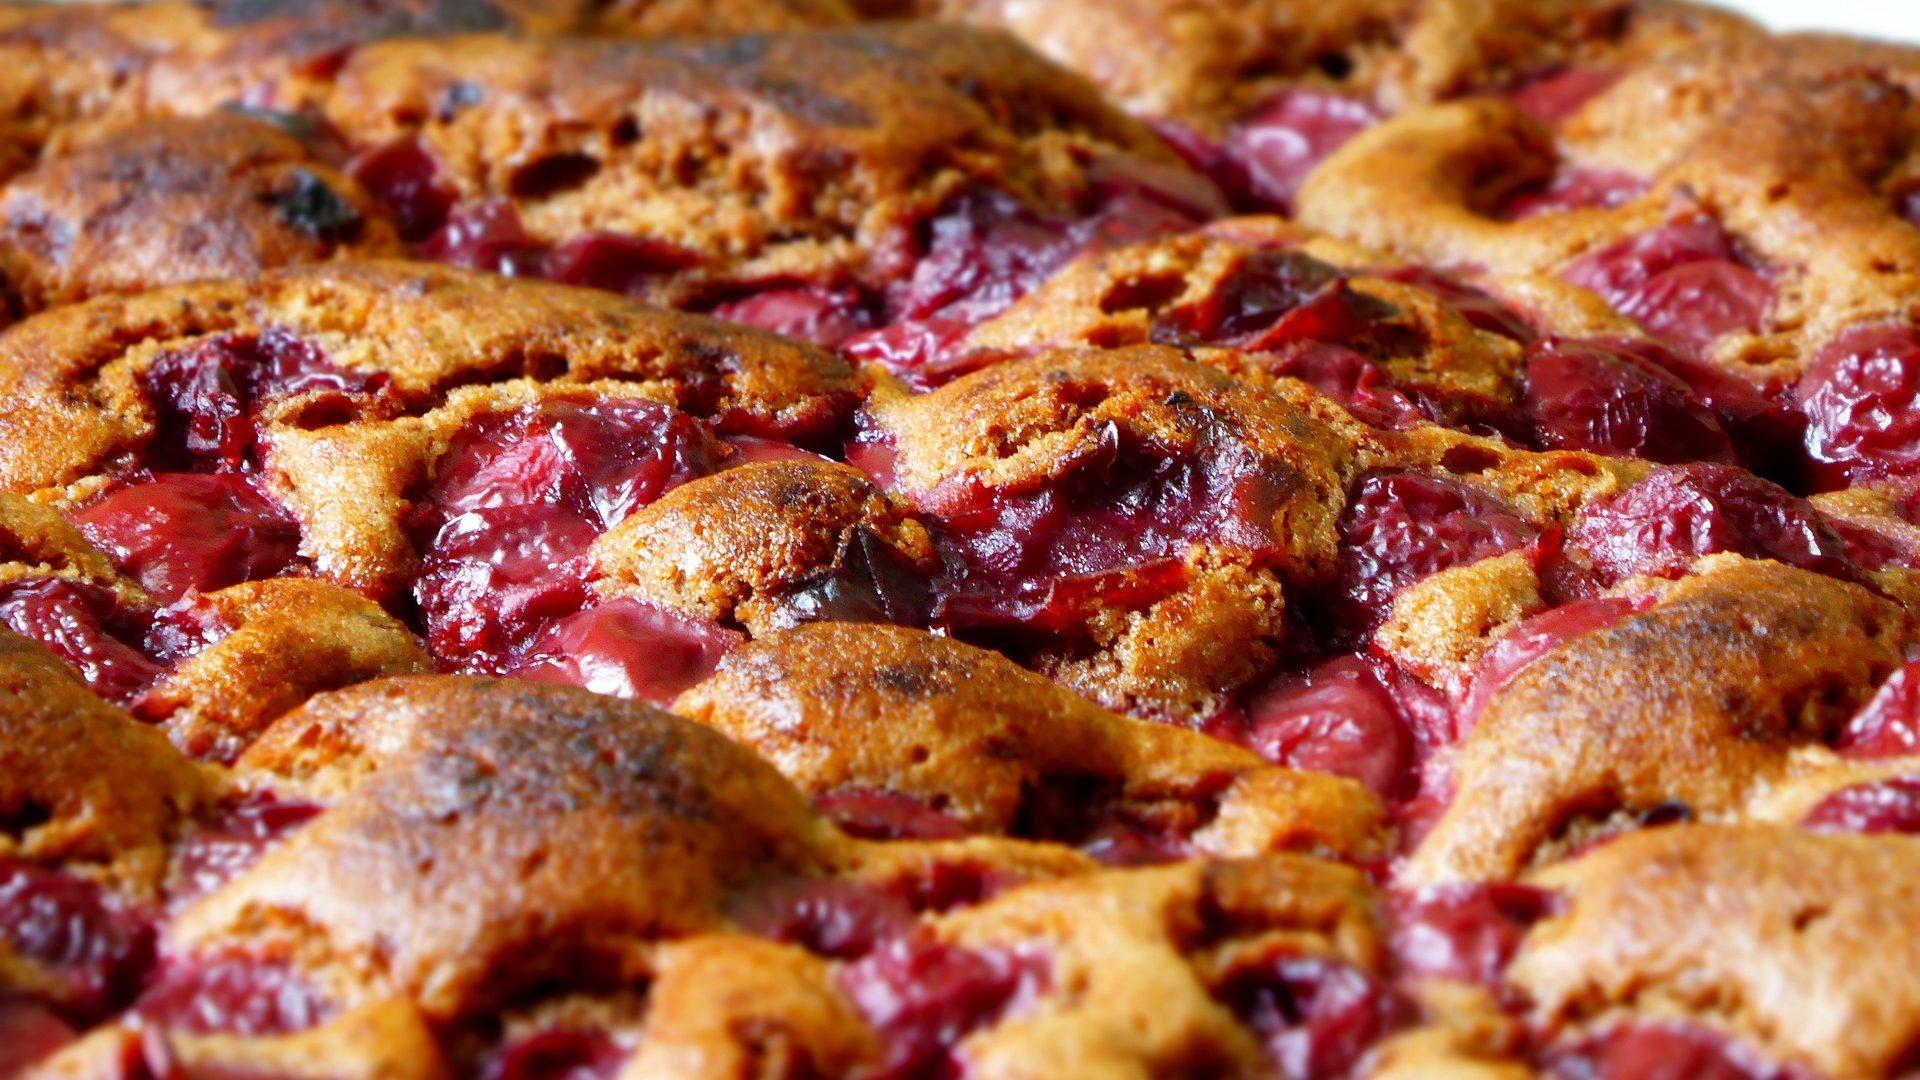 sour-cherry-cake-827462_1920